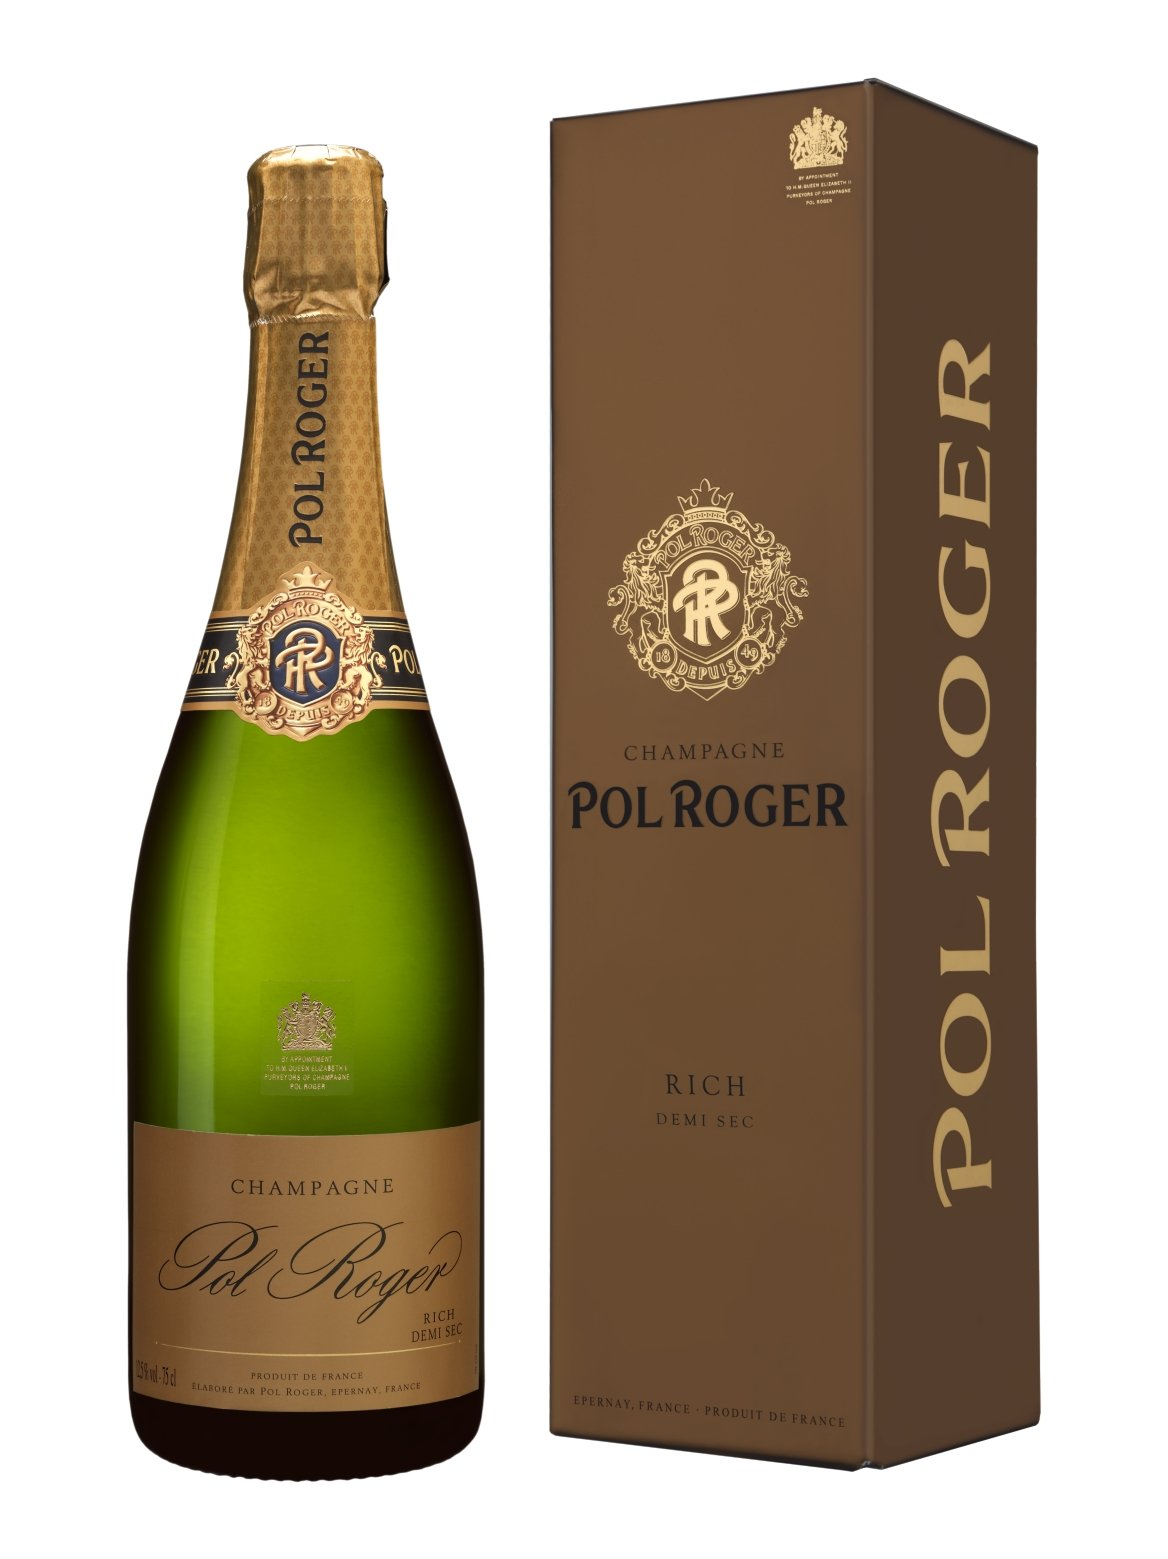 Champagne-Pol-Roger-Rich-Demi-sec-im-Etui-1er-Pack-1-x-750-ml